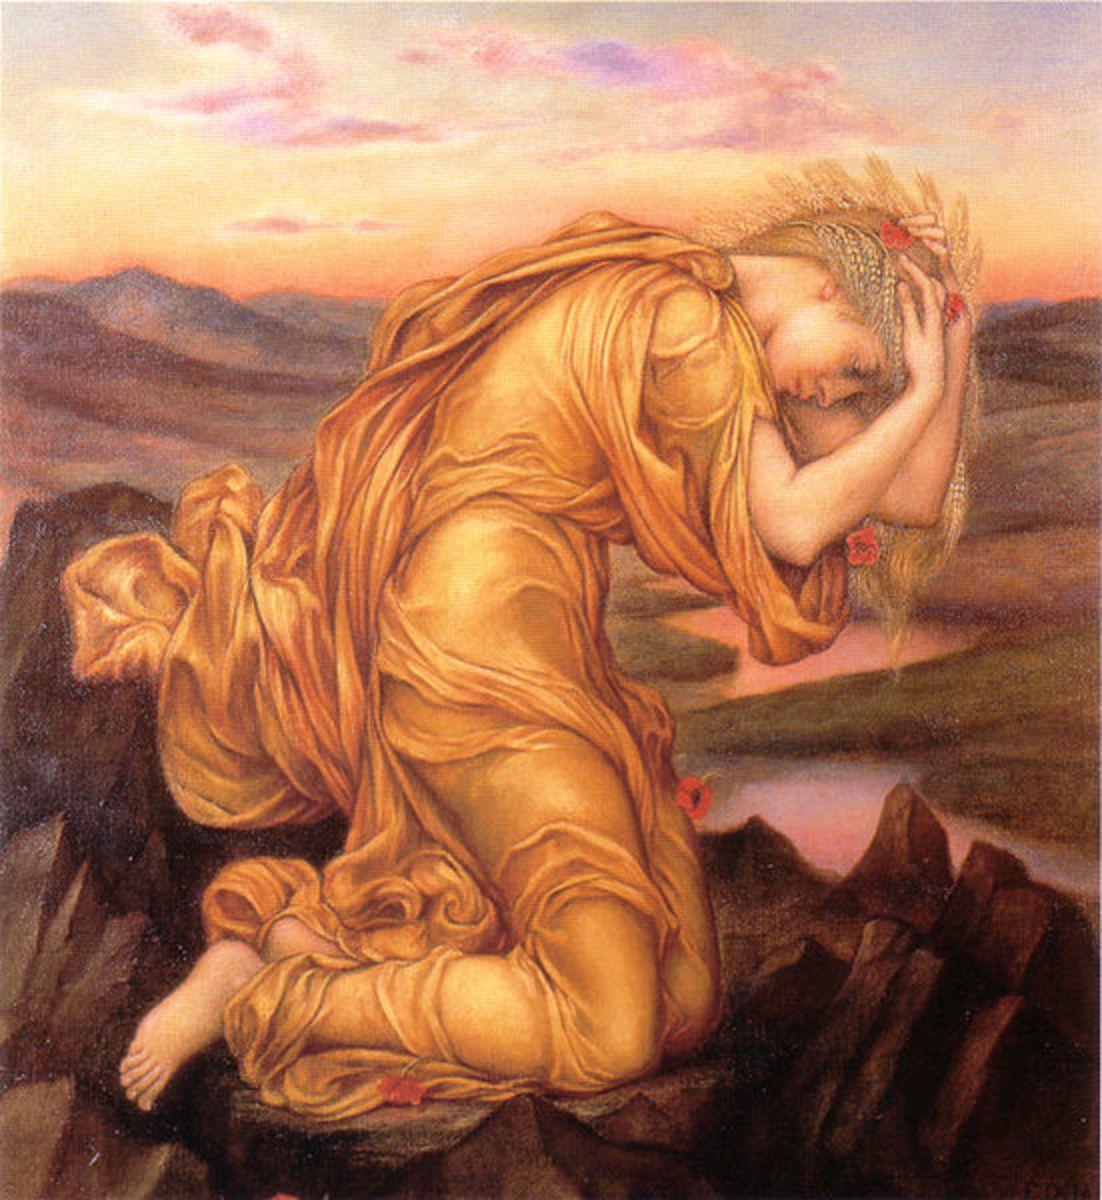 Demeter Mourning - Evelyn De Morgan (1855–1919) - PD-art-100